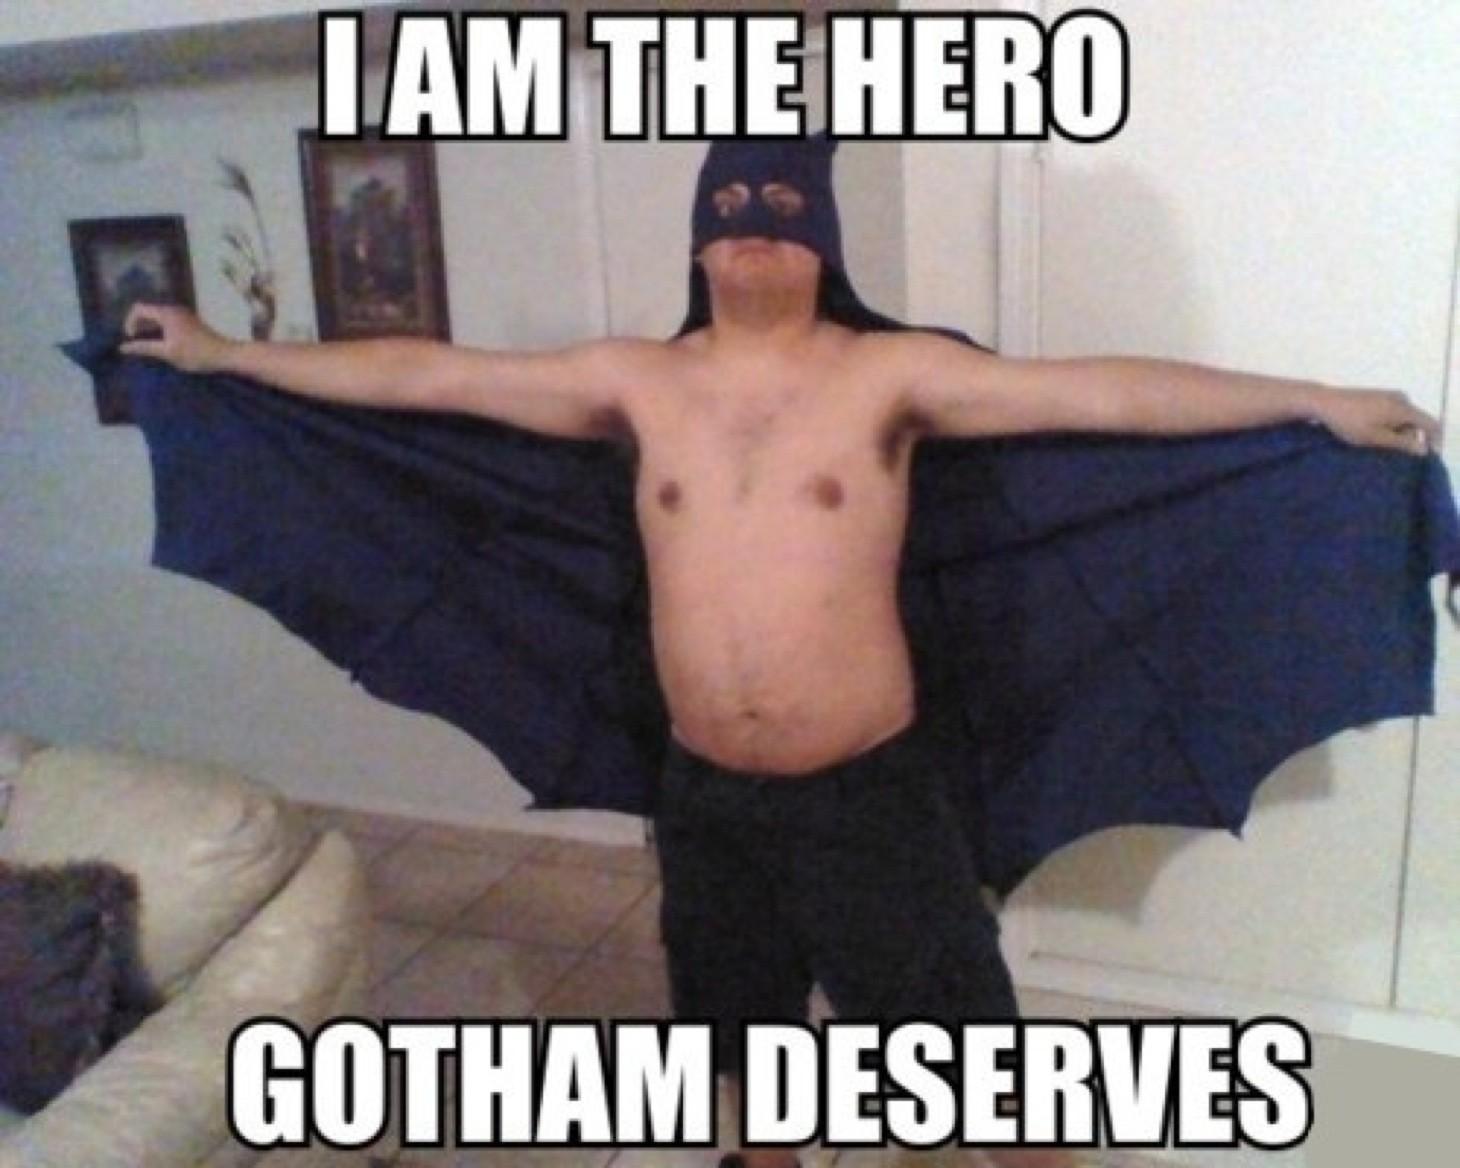 http://images.lazygamer.net/2013/05/wpid98639-the-dark-knight-rises-funny-pictures-batman-meme.jpg